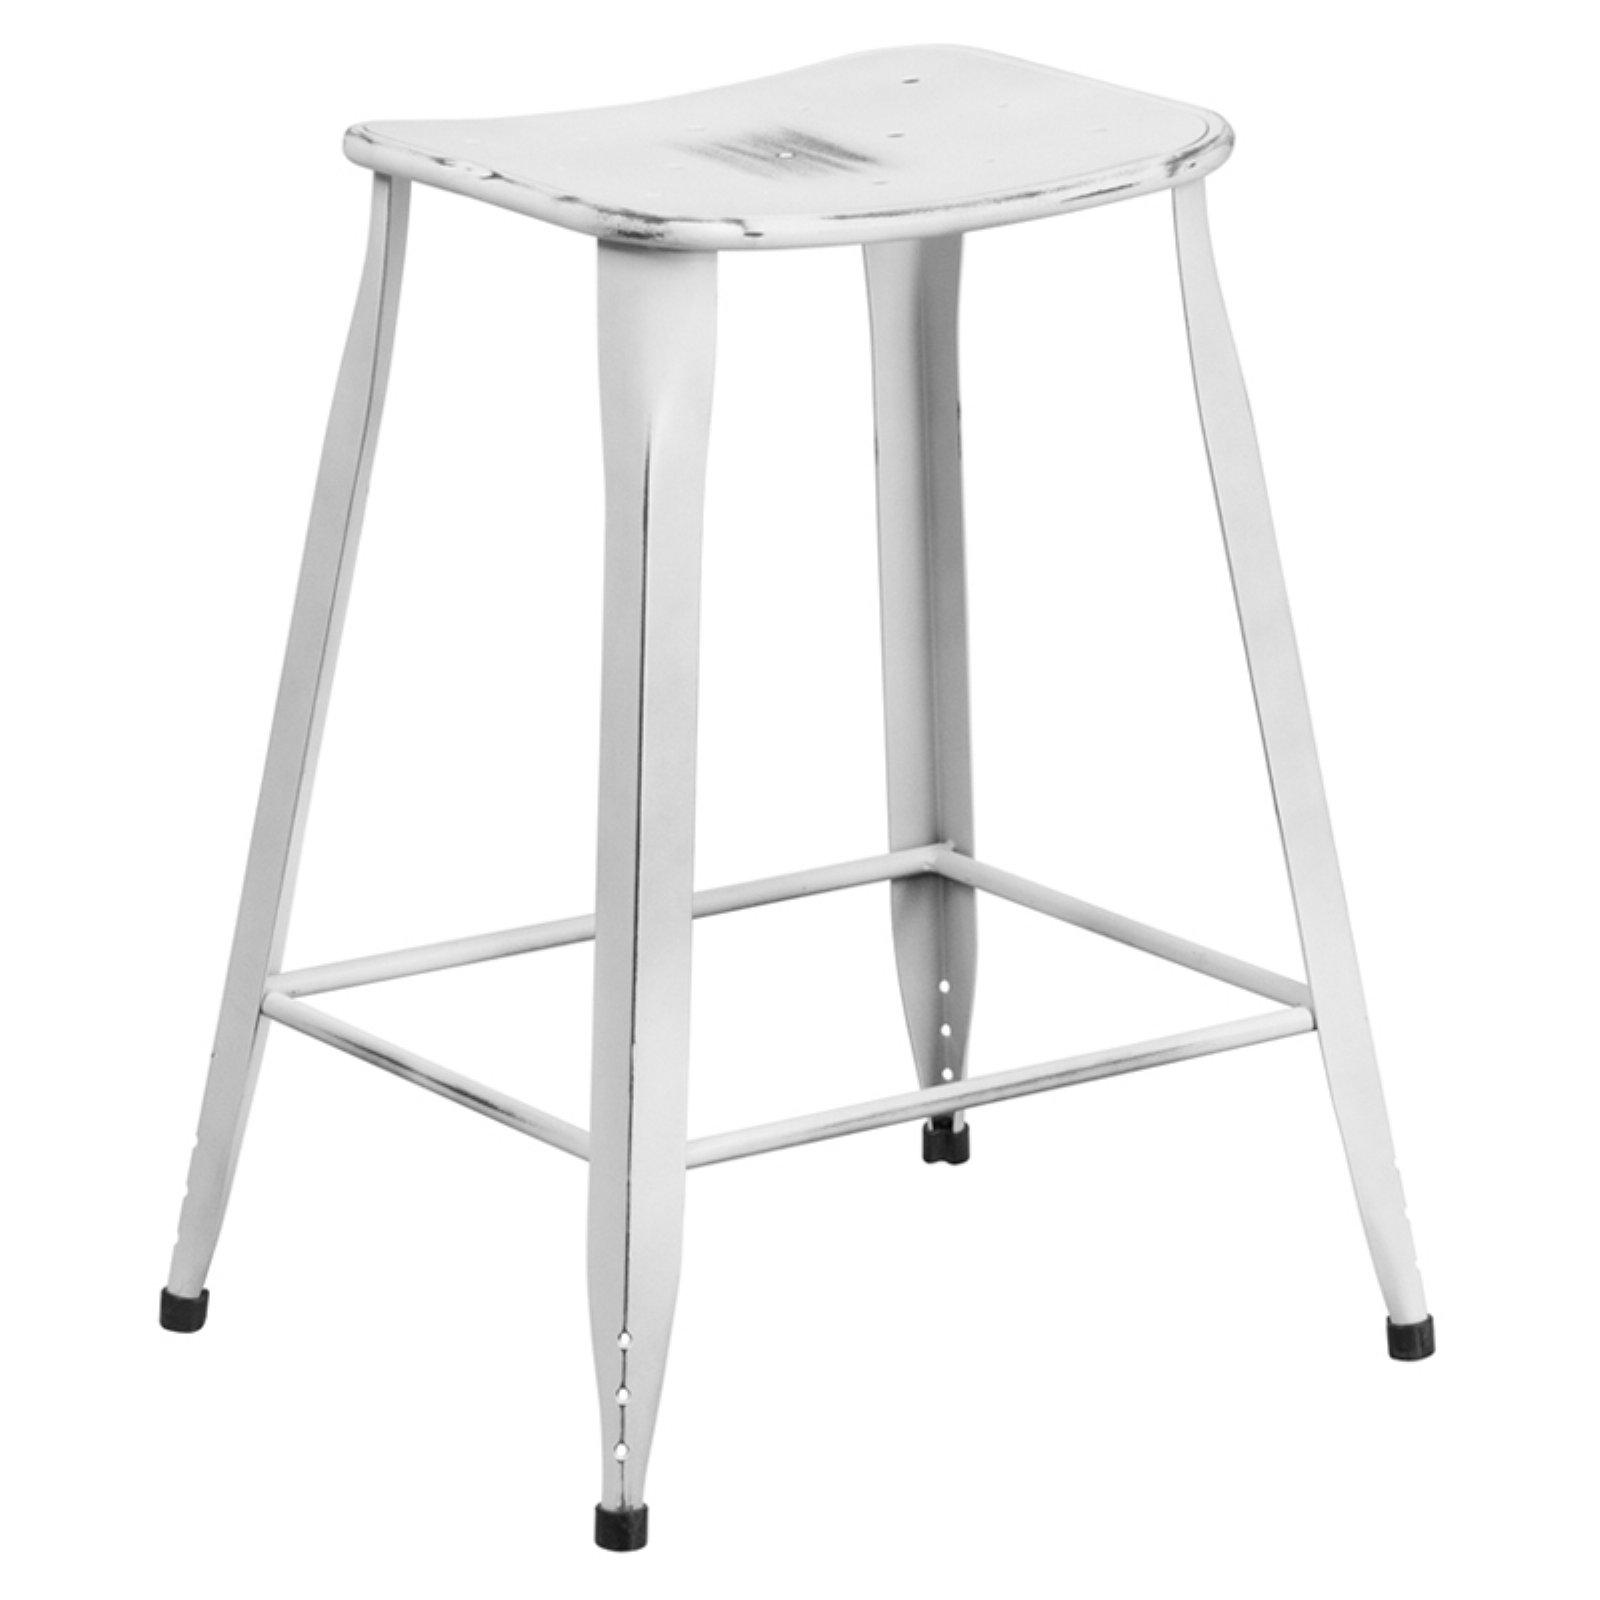 Flash Furniture 24 In High Distressed Metal Indooroutdoor Counter